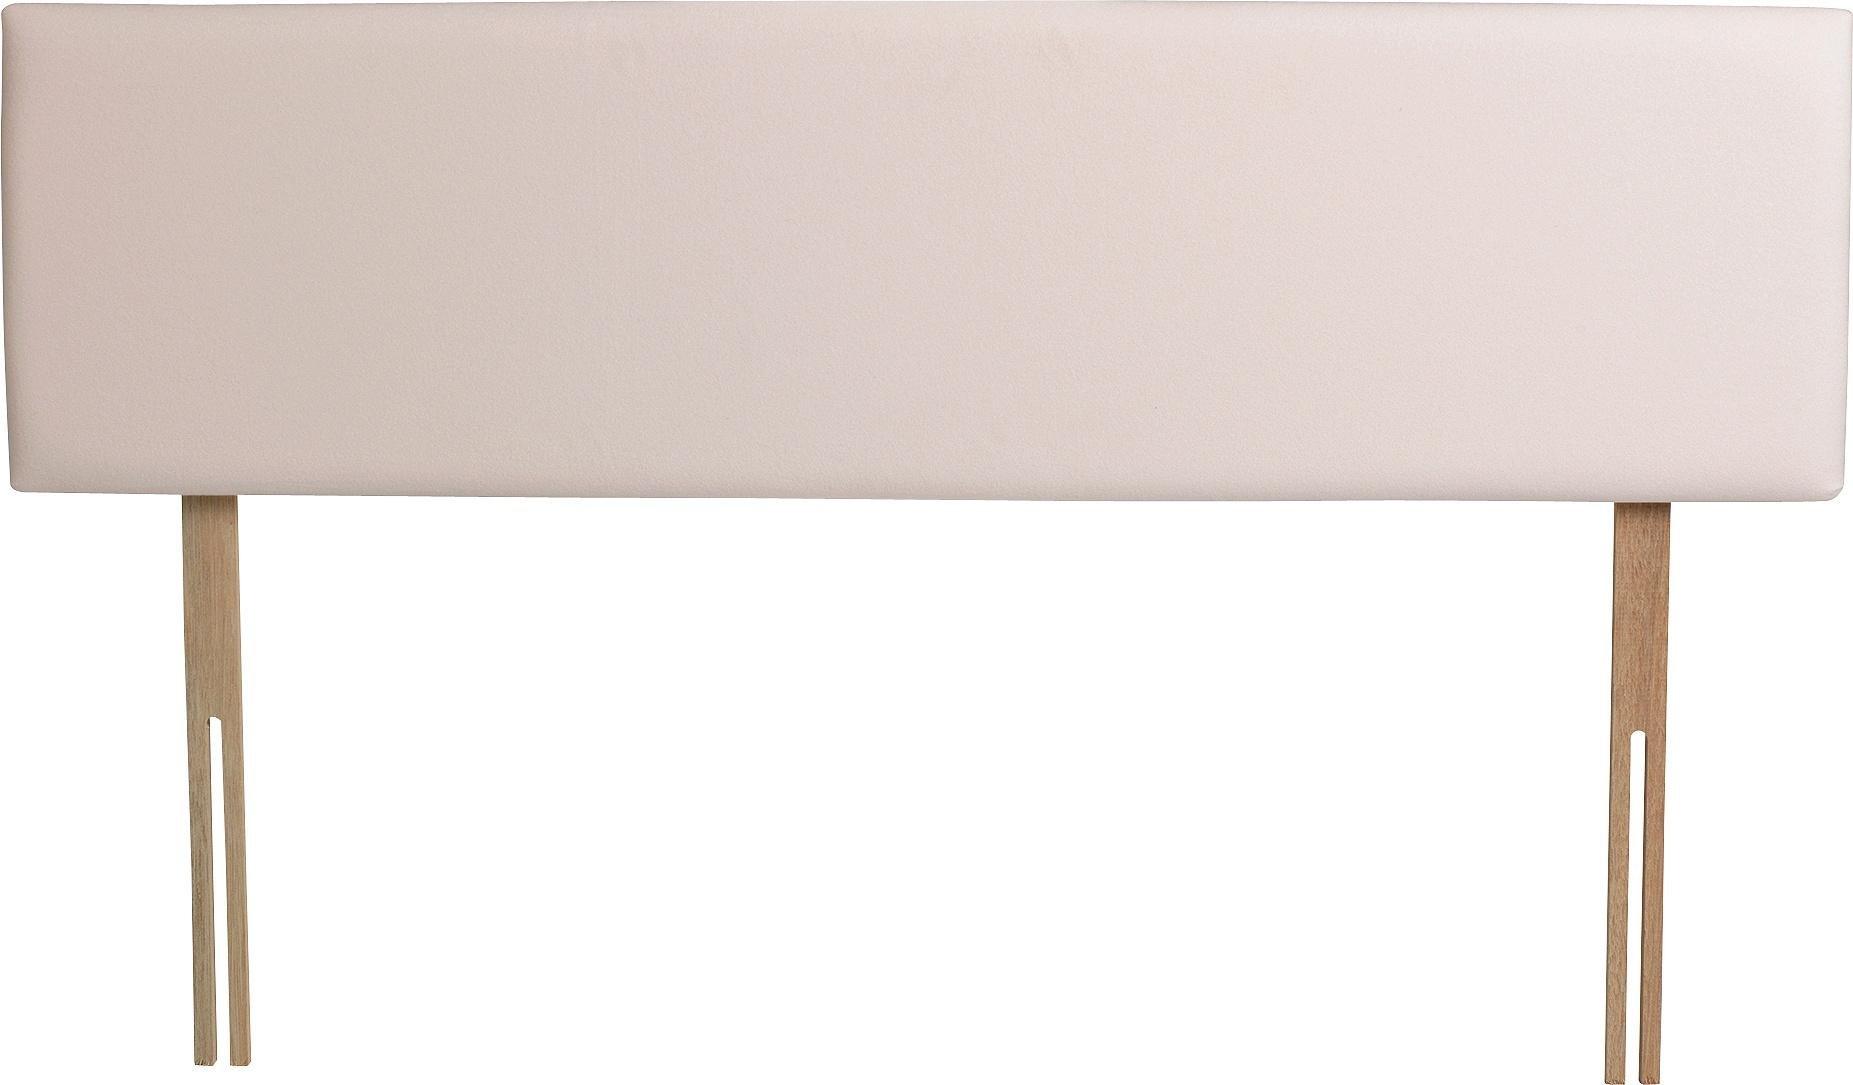 Airsprung Hollis Small Double Headboard - Cream